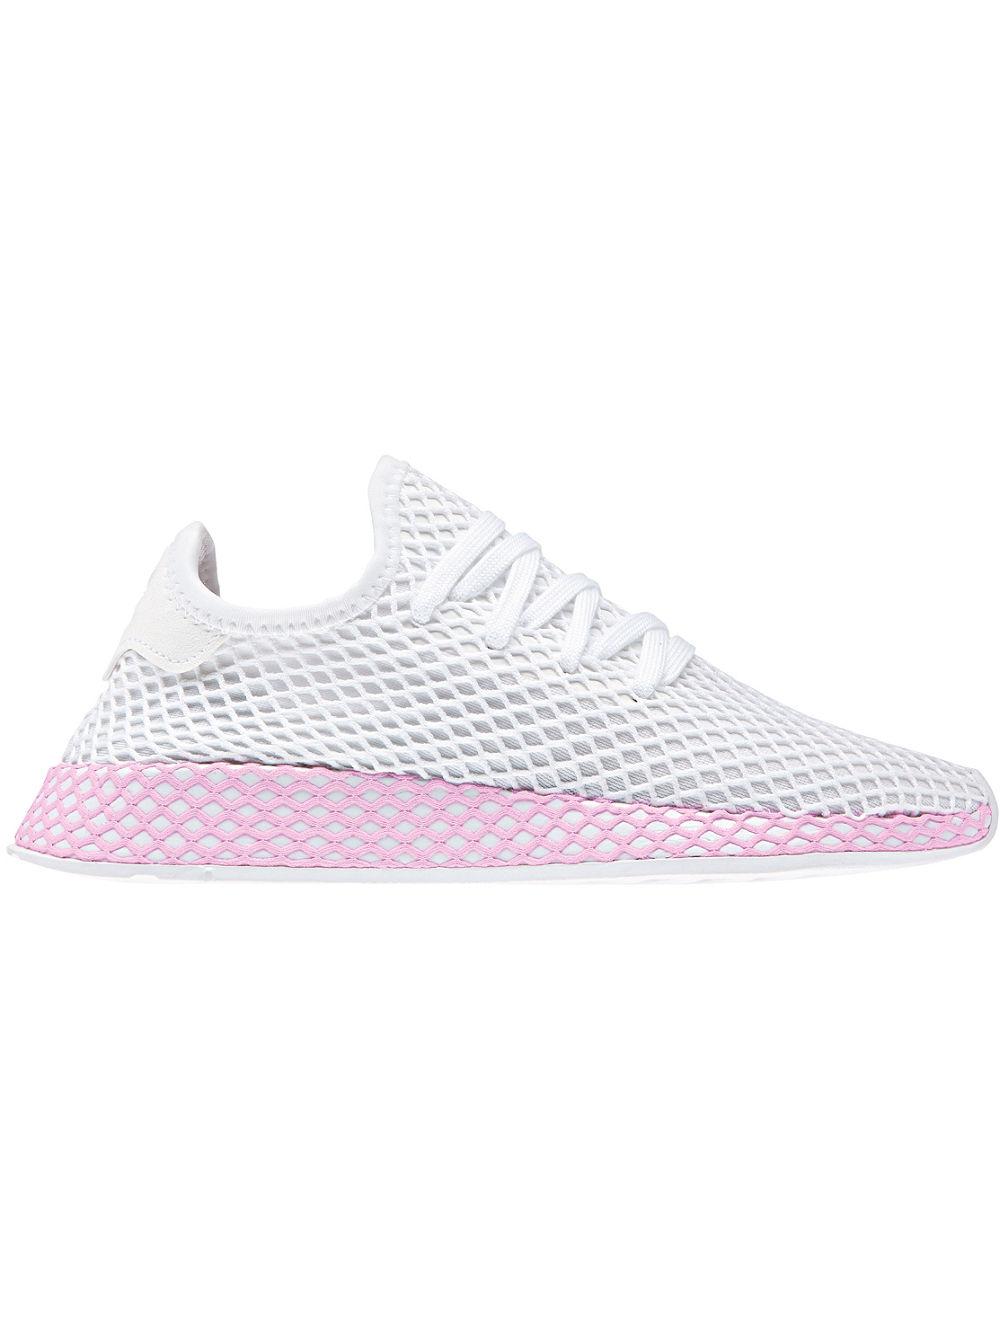 53cbb8585b4c24 Buy adidas Originals Deerupt Sneakers online at blue-tomato.com